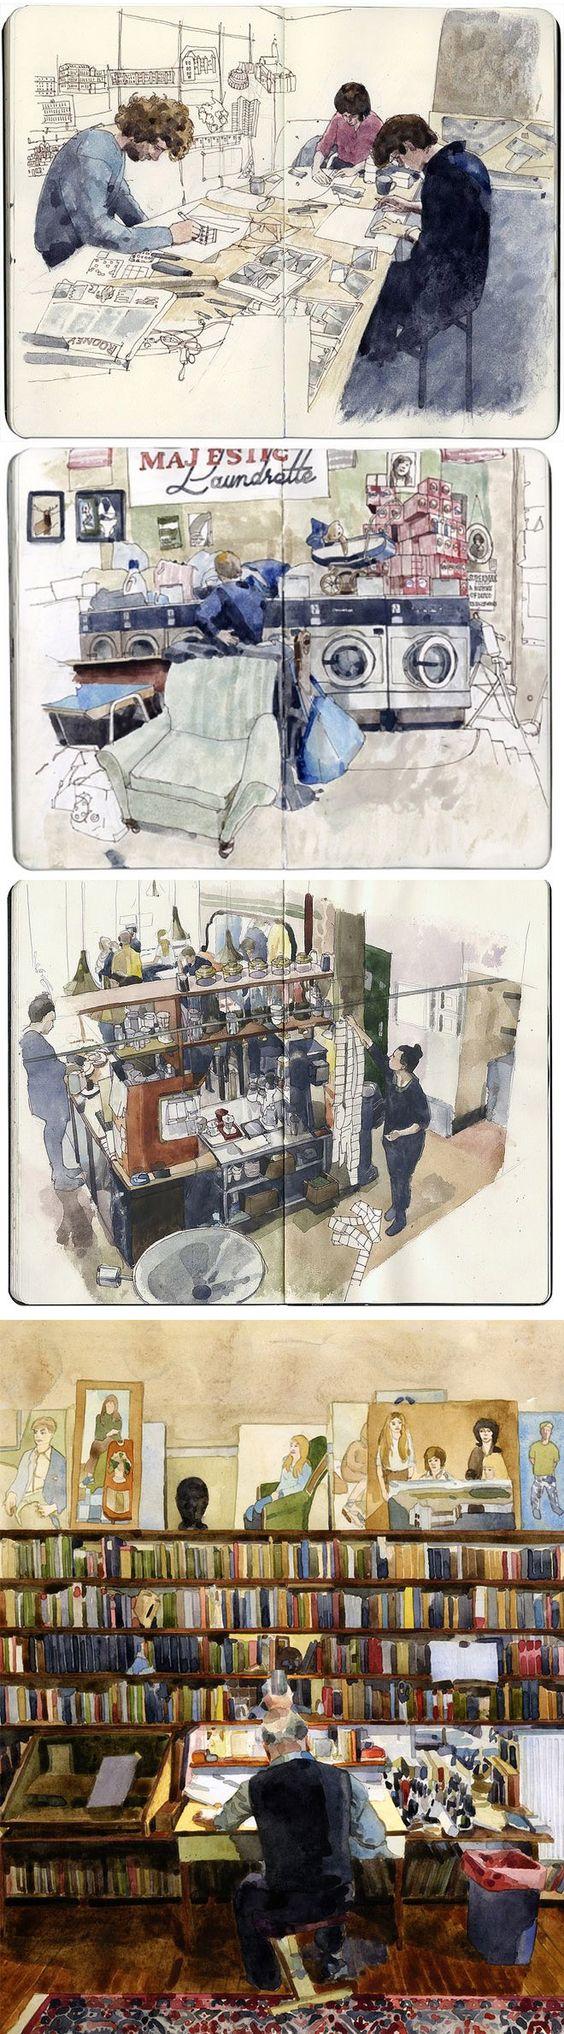 illustrated by Wil Freeborn #sketchbook #journal https://www.flickr.com/photos/ghostschool/: